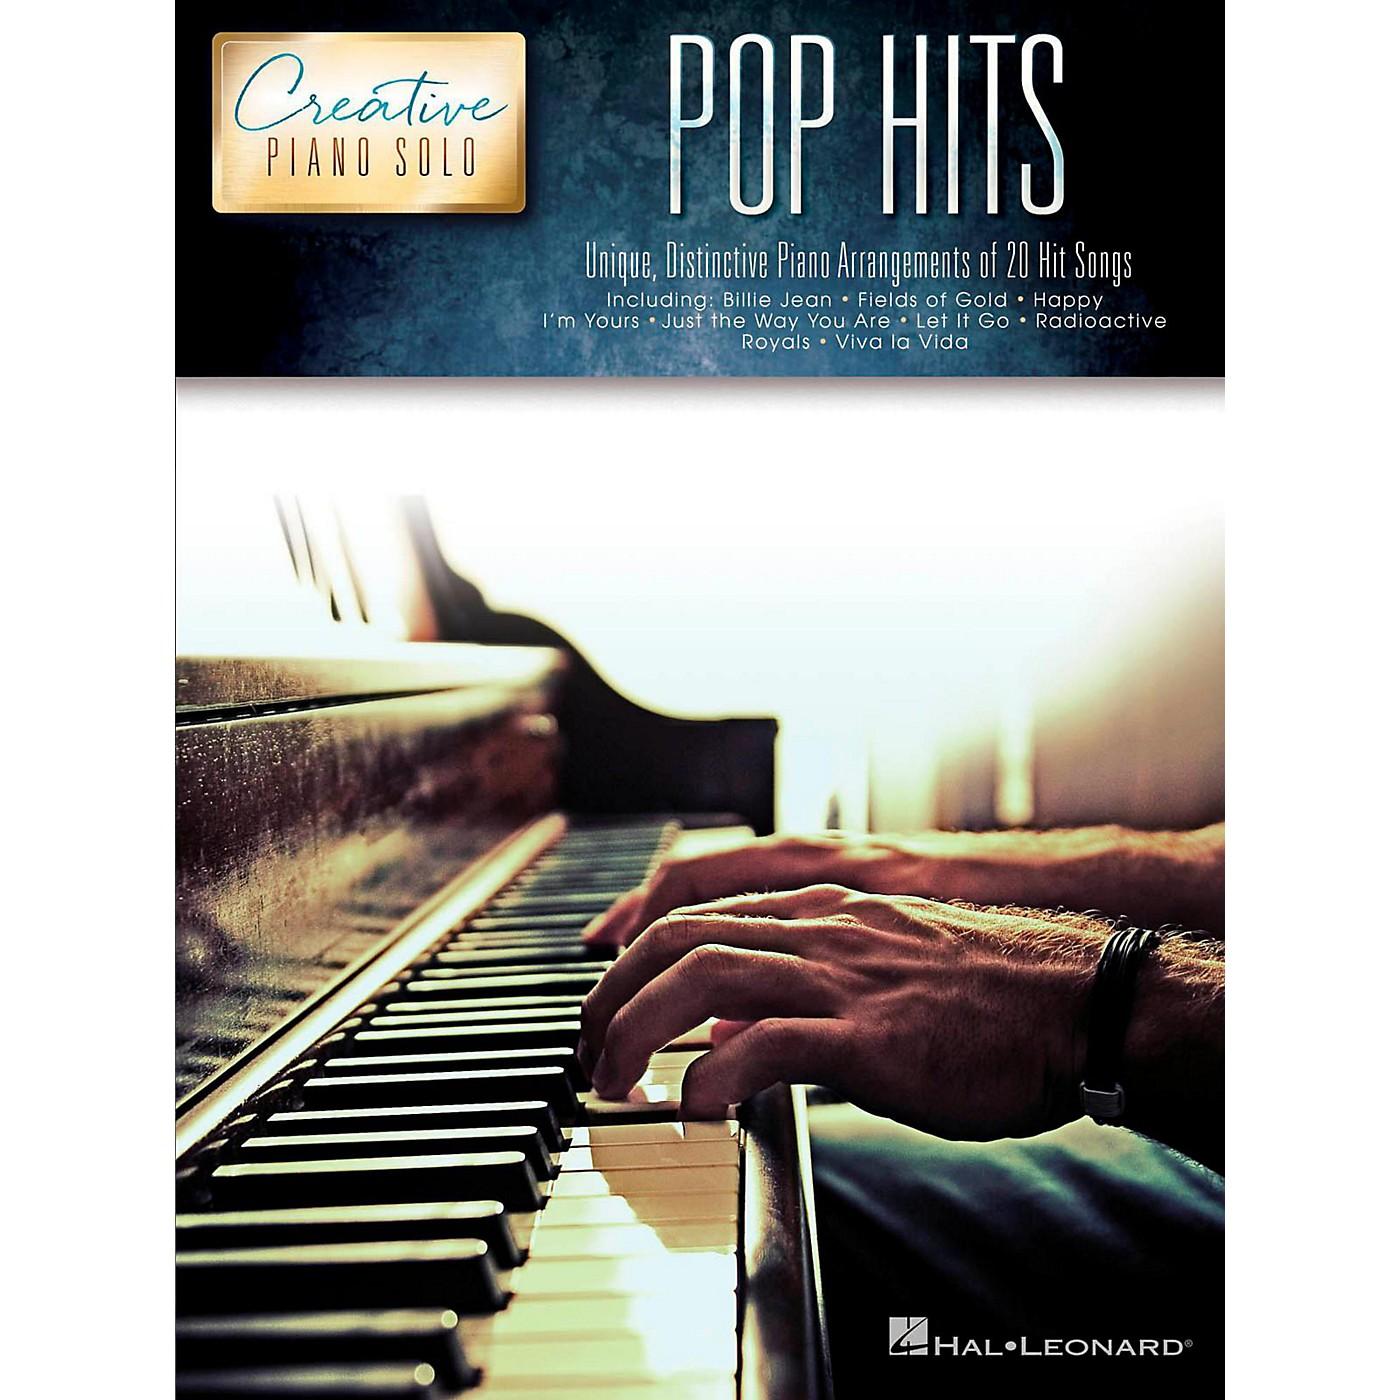 Hal Leonard Pop Hits - Creative Piano Solo Songbook thumbnail